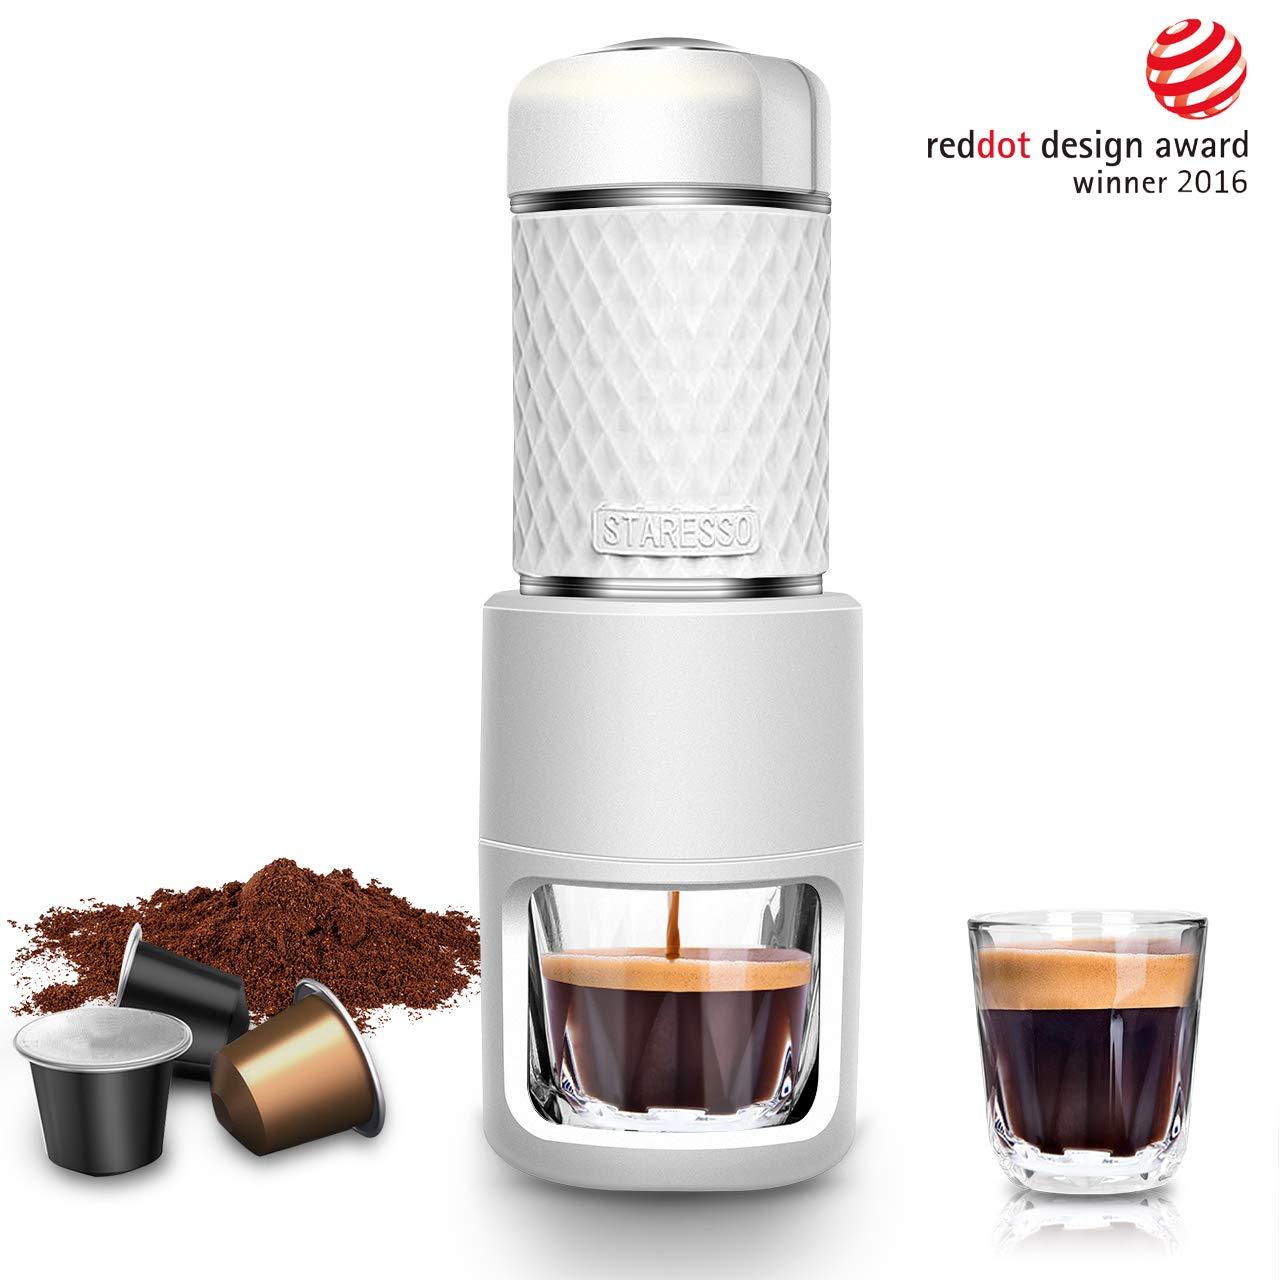 STARESSO Portable Espresso Maker, Mini Espresso Machine with BPA-Free Material for Rich & Thick Crema Manual Espresso, Compatible with Nespresso Pods & Ground Coffee, Compact Travel Coffee Maker by STARESSO